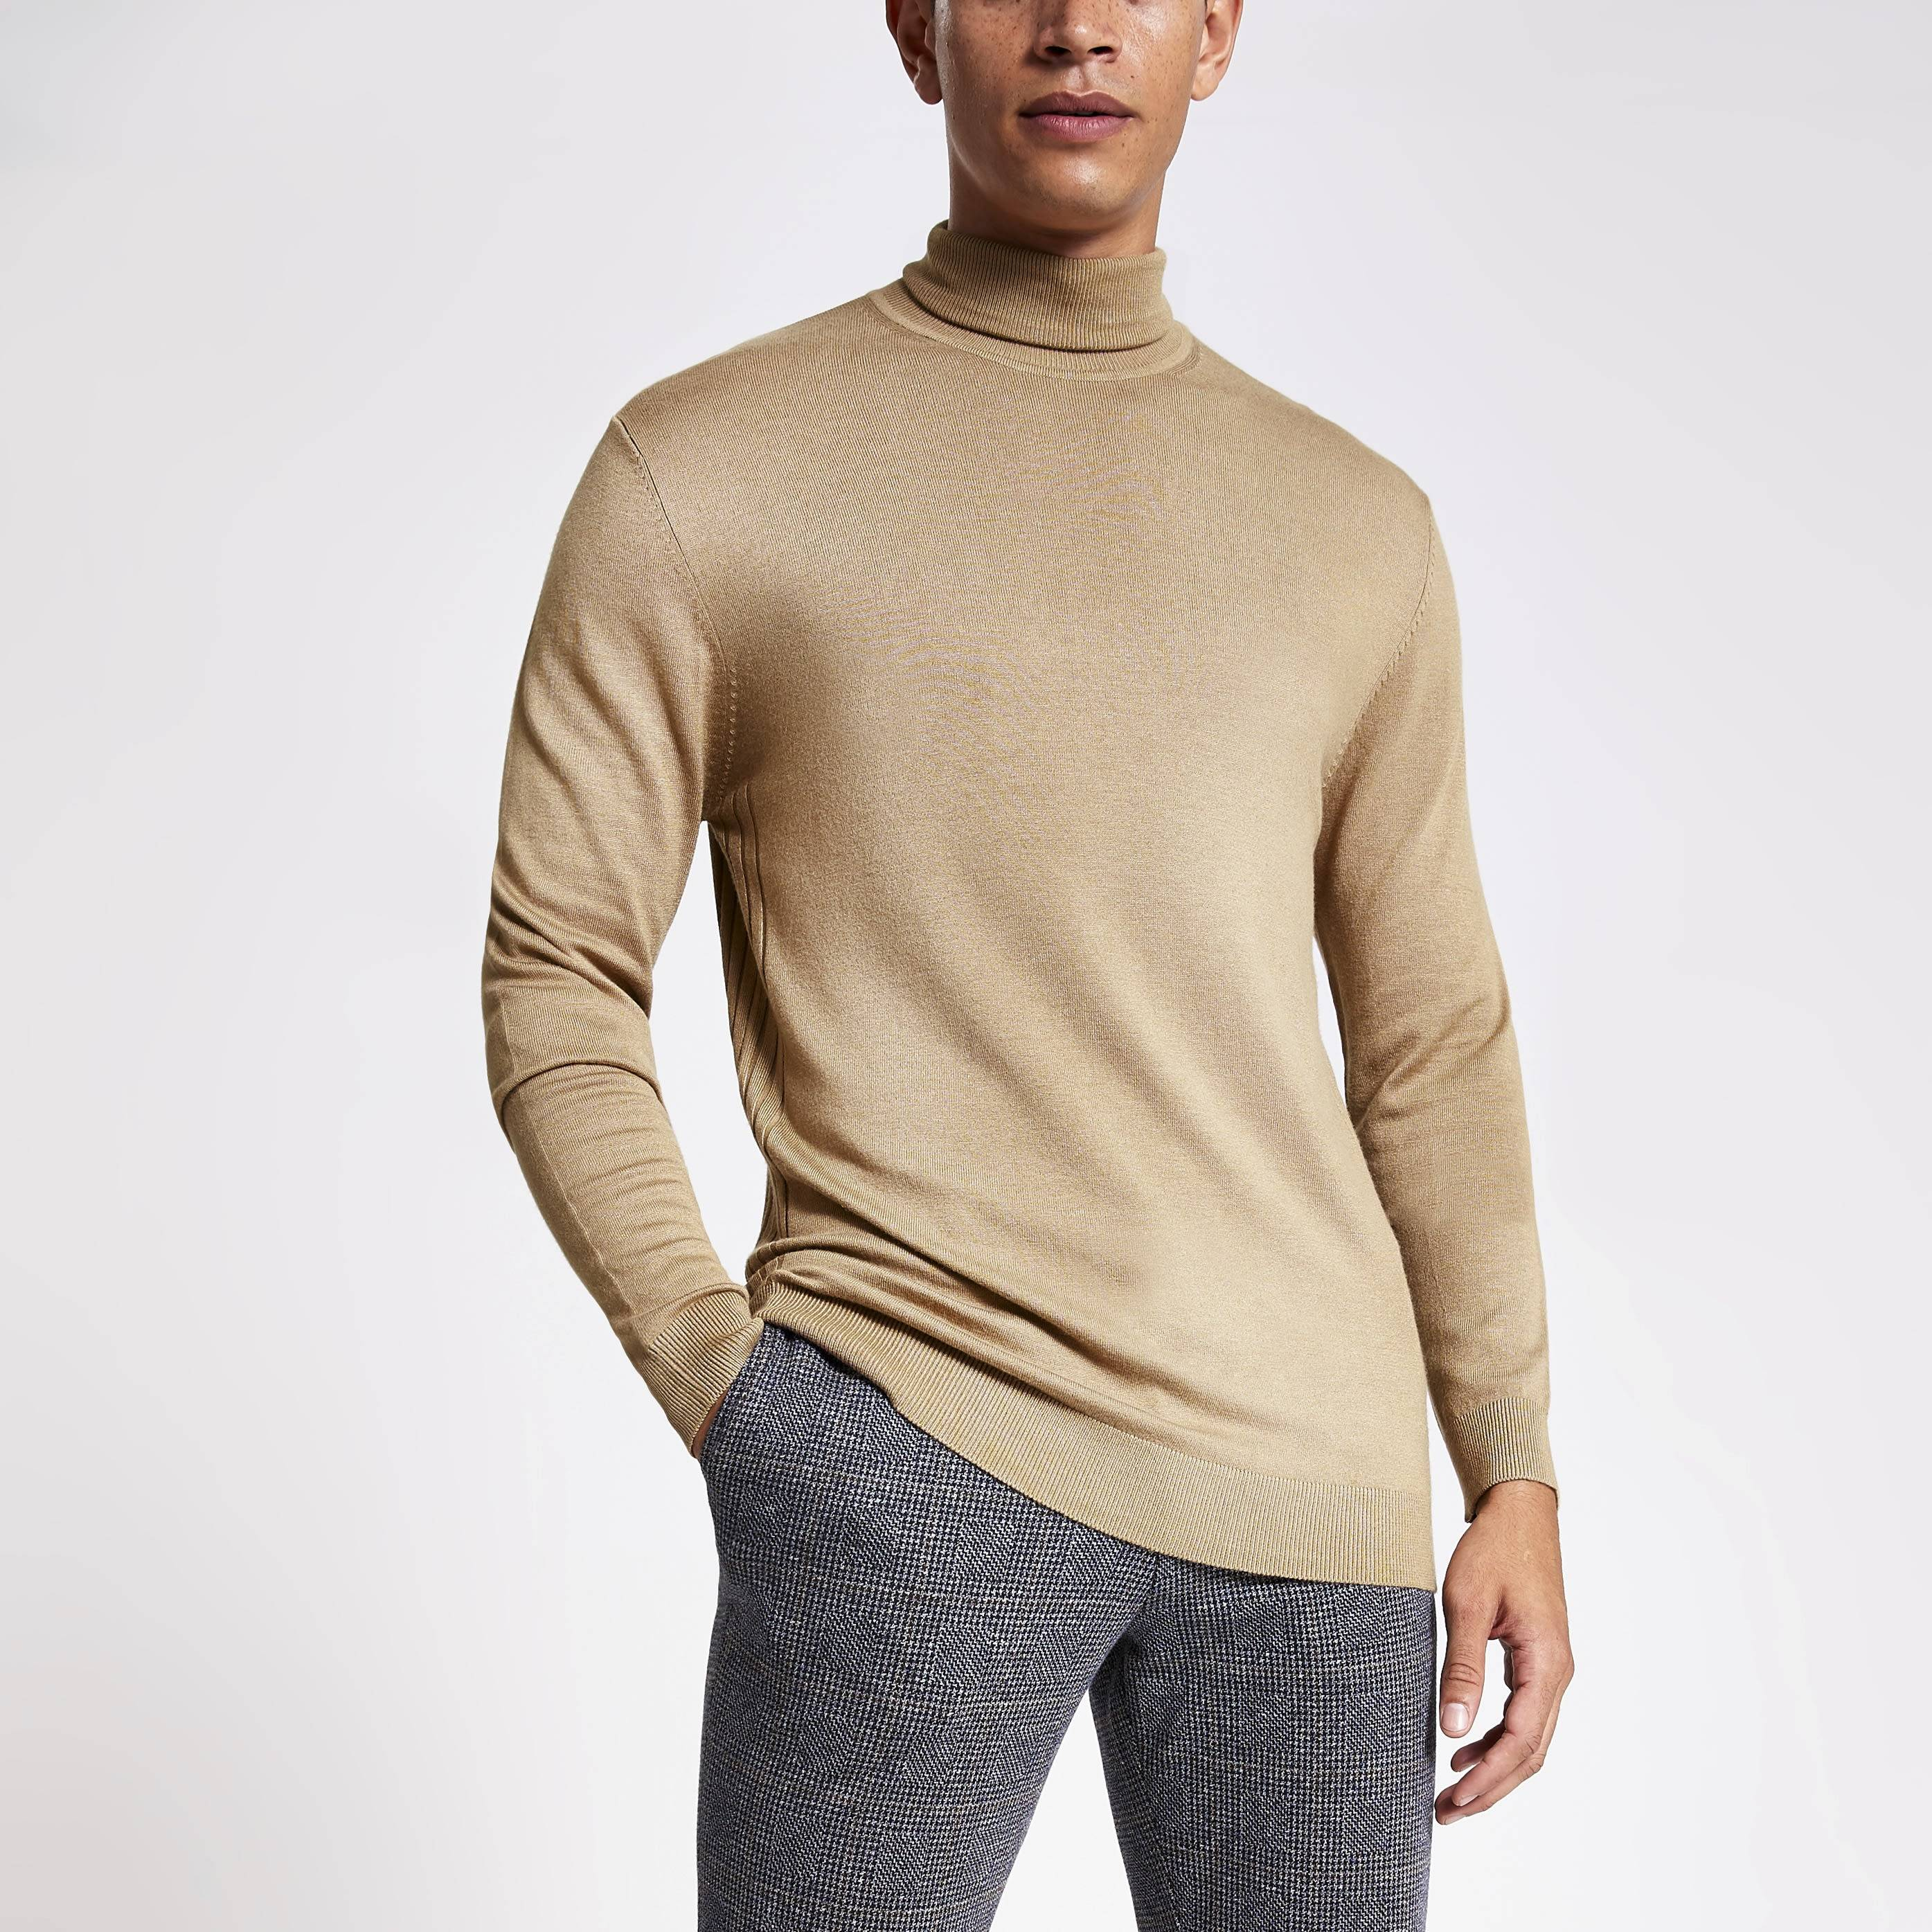 river island Mens Brown slim fit roll neck knitted jumper (L)